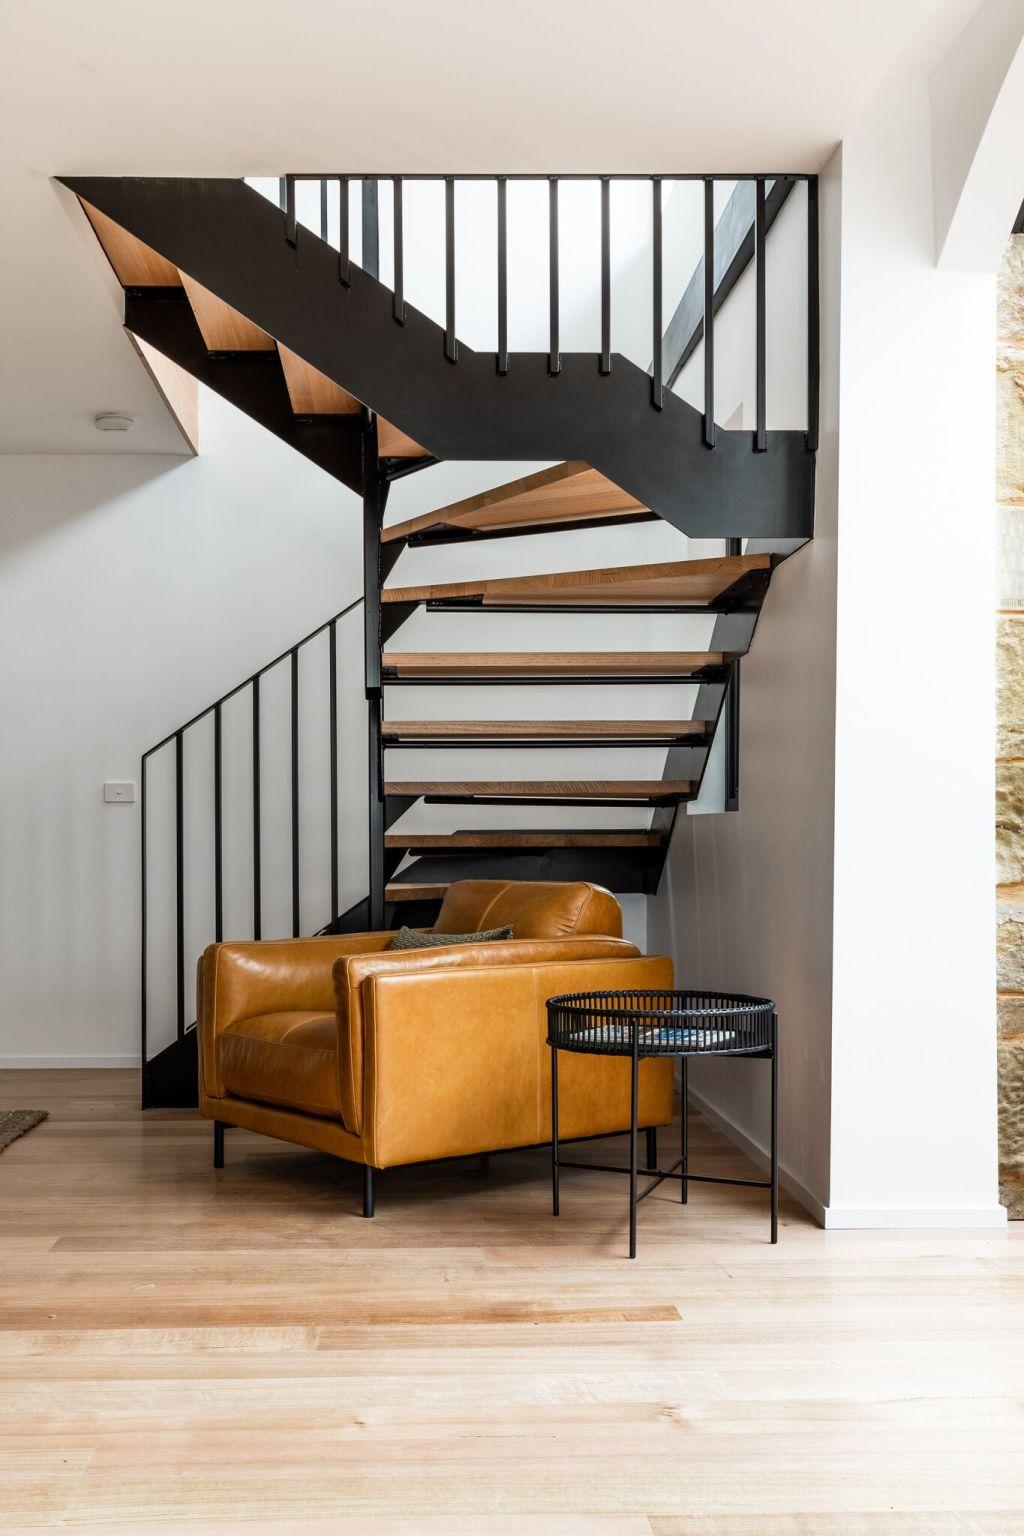 stairway_as_sculpture_pix_Adam_Gibson_lete7a